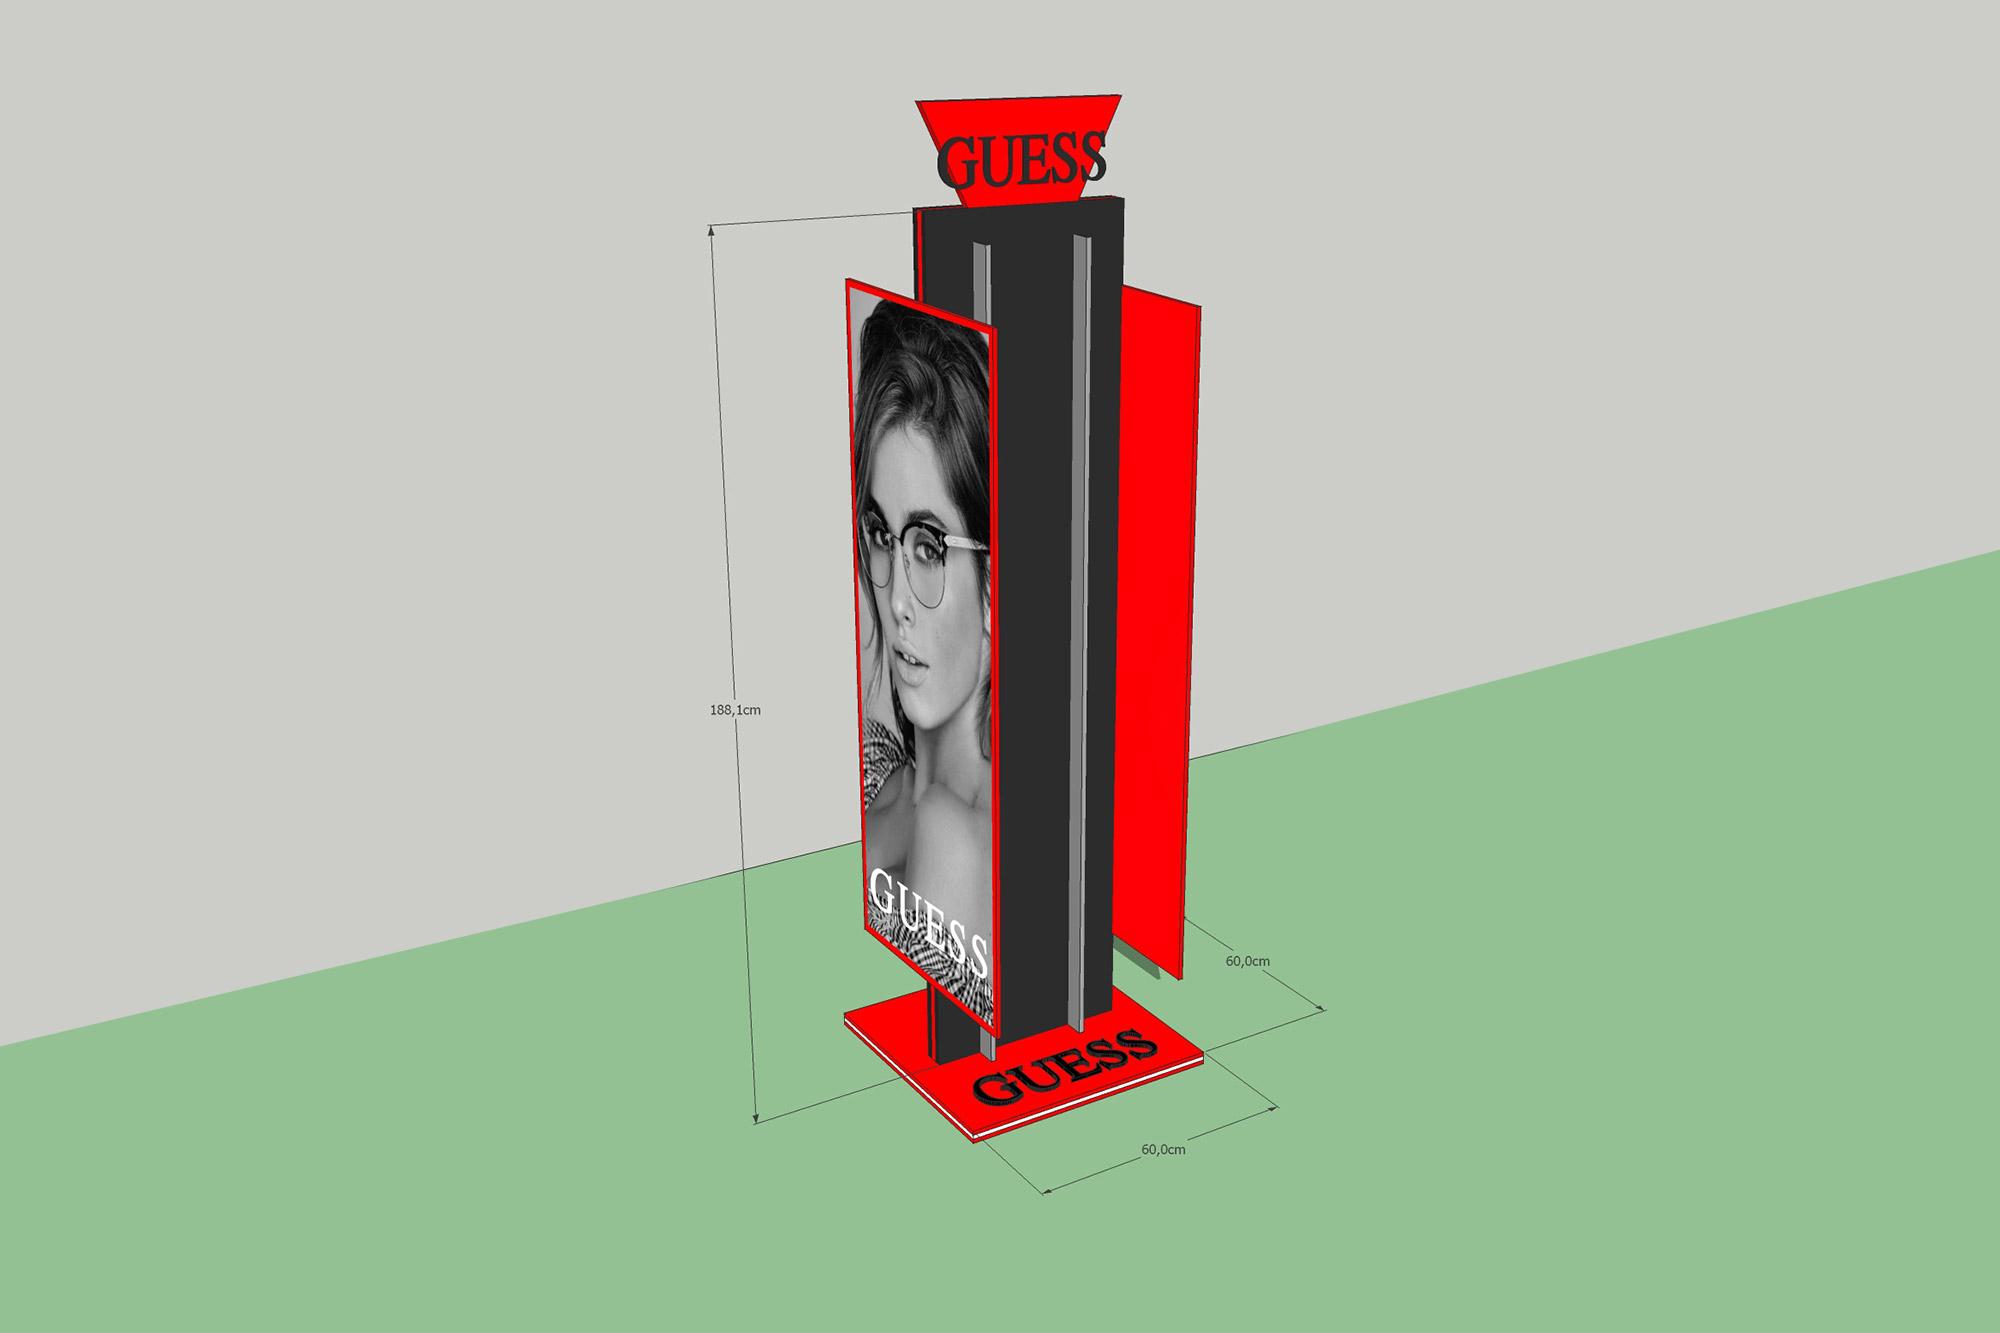 projekt stojaka reklamowaego, projektowanie ekspozytorów, projekt 3d stojaka, ekspozytor na okulary projekt